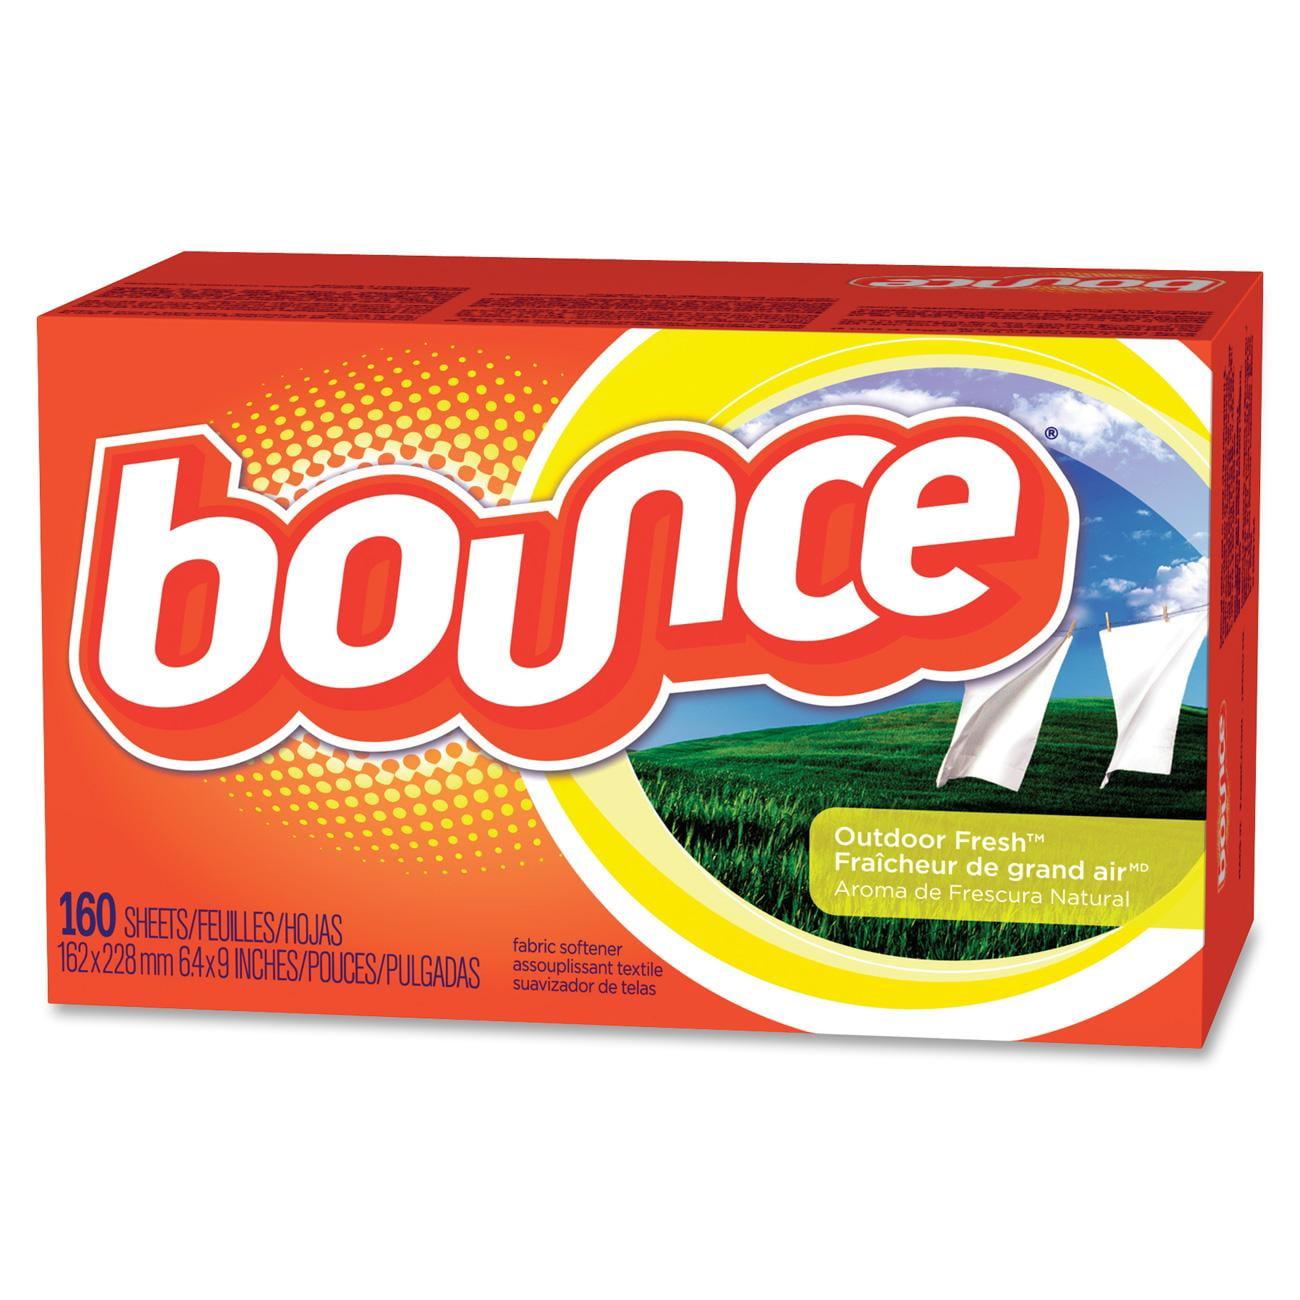 P&g Bounce Dryer Sheet - Wipe - Orange (PAG80168)